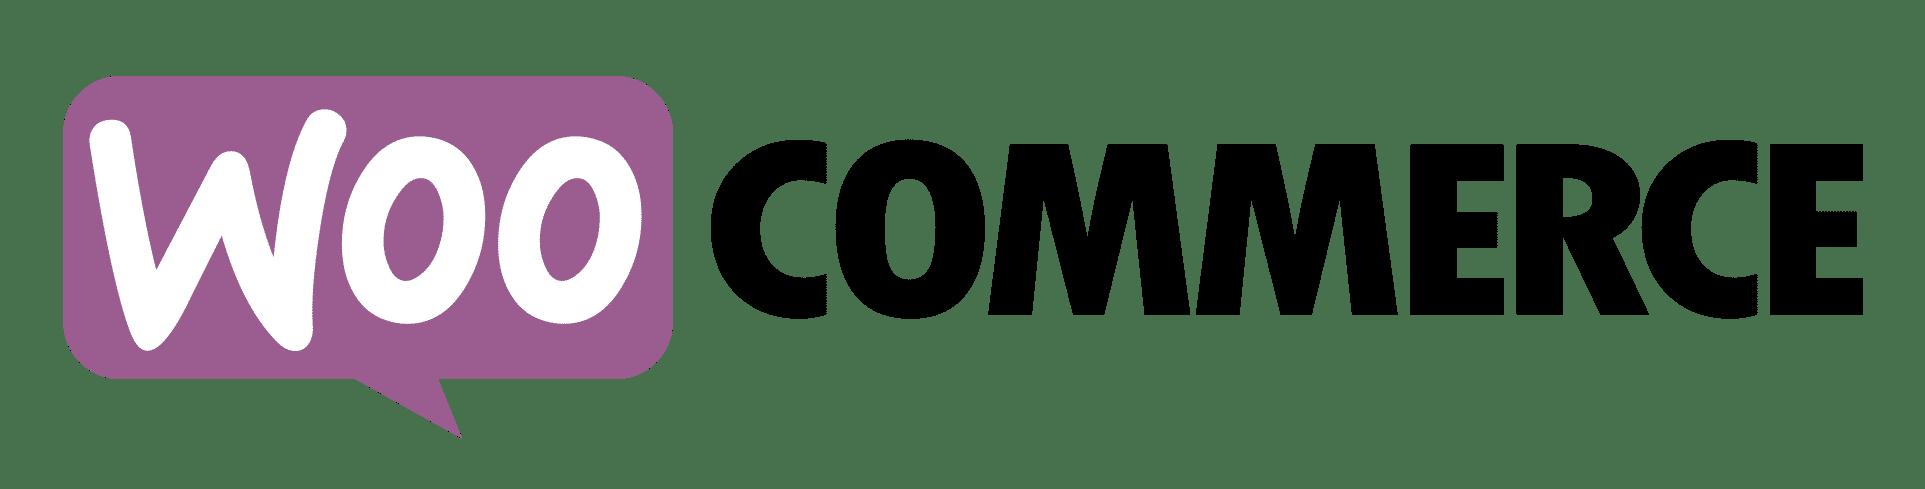 We build WooCommerce online stores.